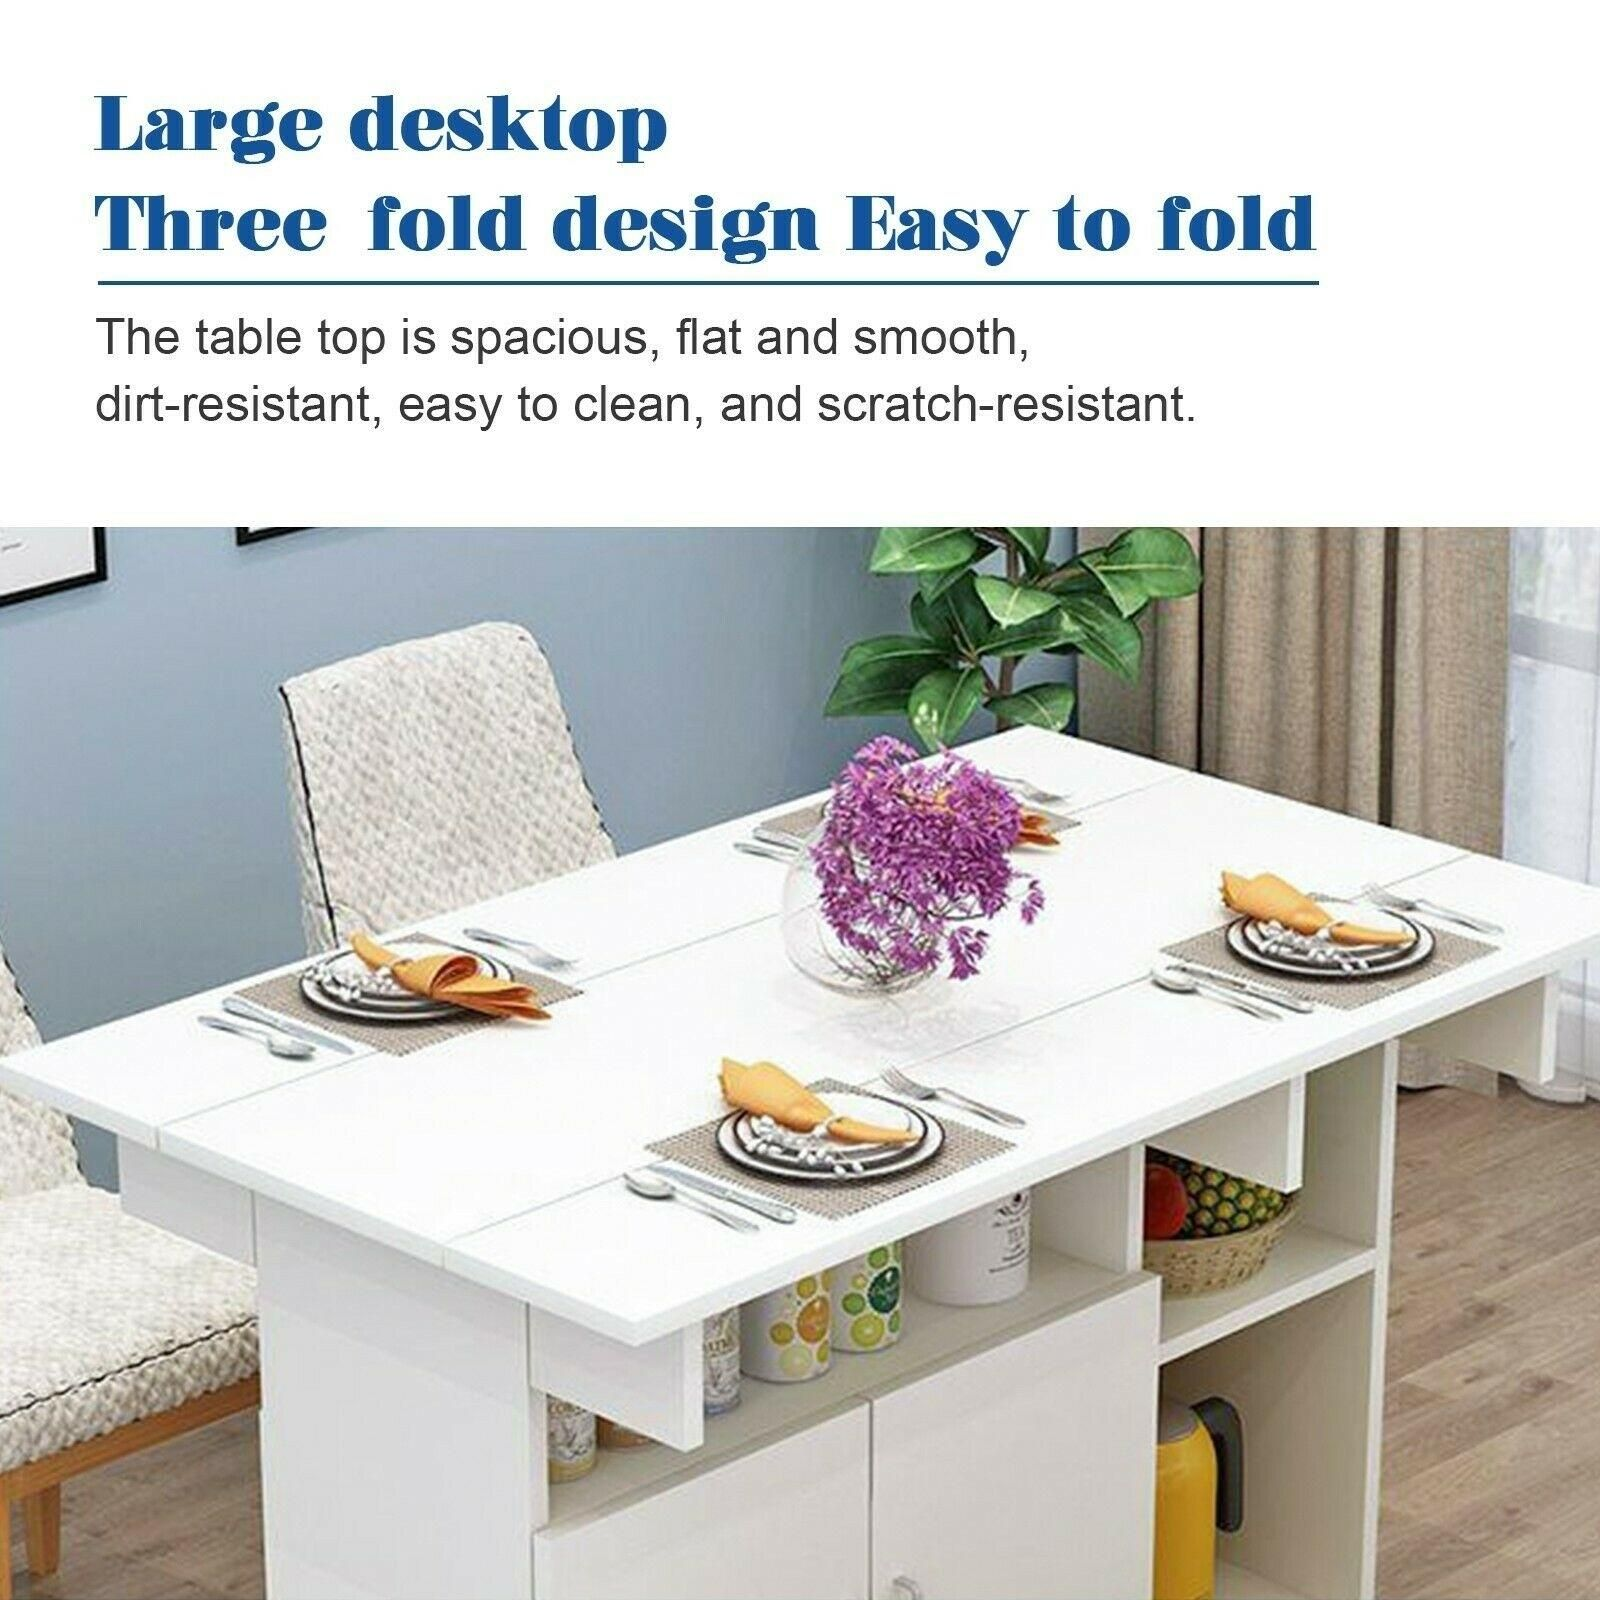 Mobile Drop Leaf Kitchen Dining Table Folding Desk With Wheels Storage Shelves